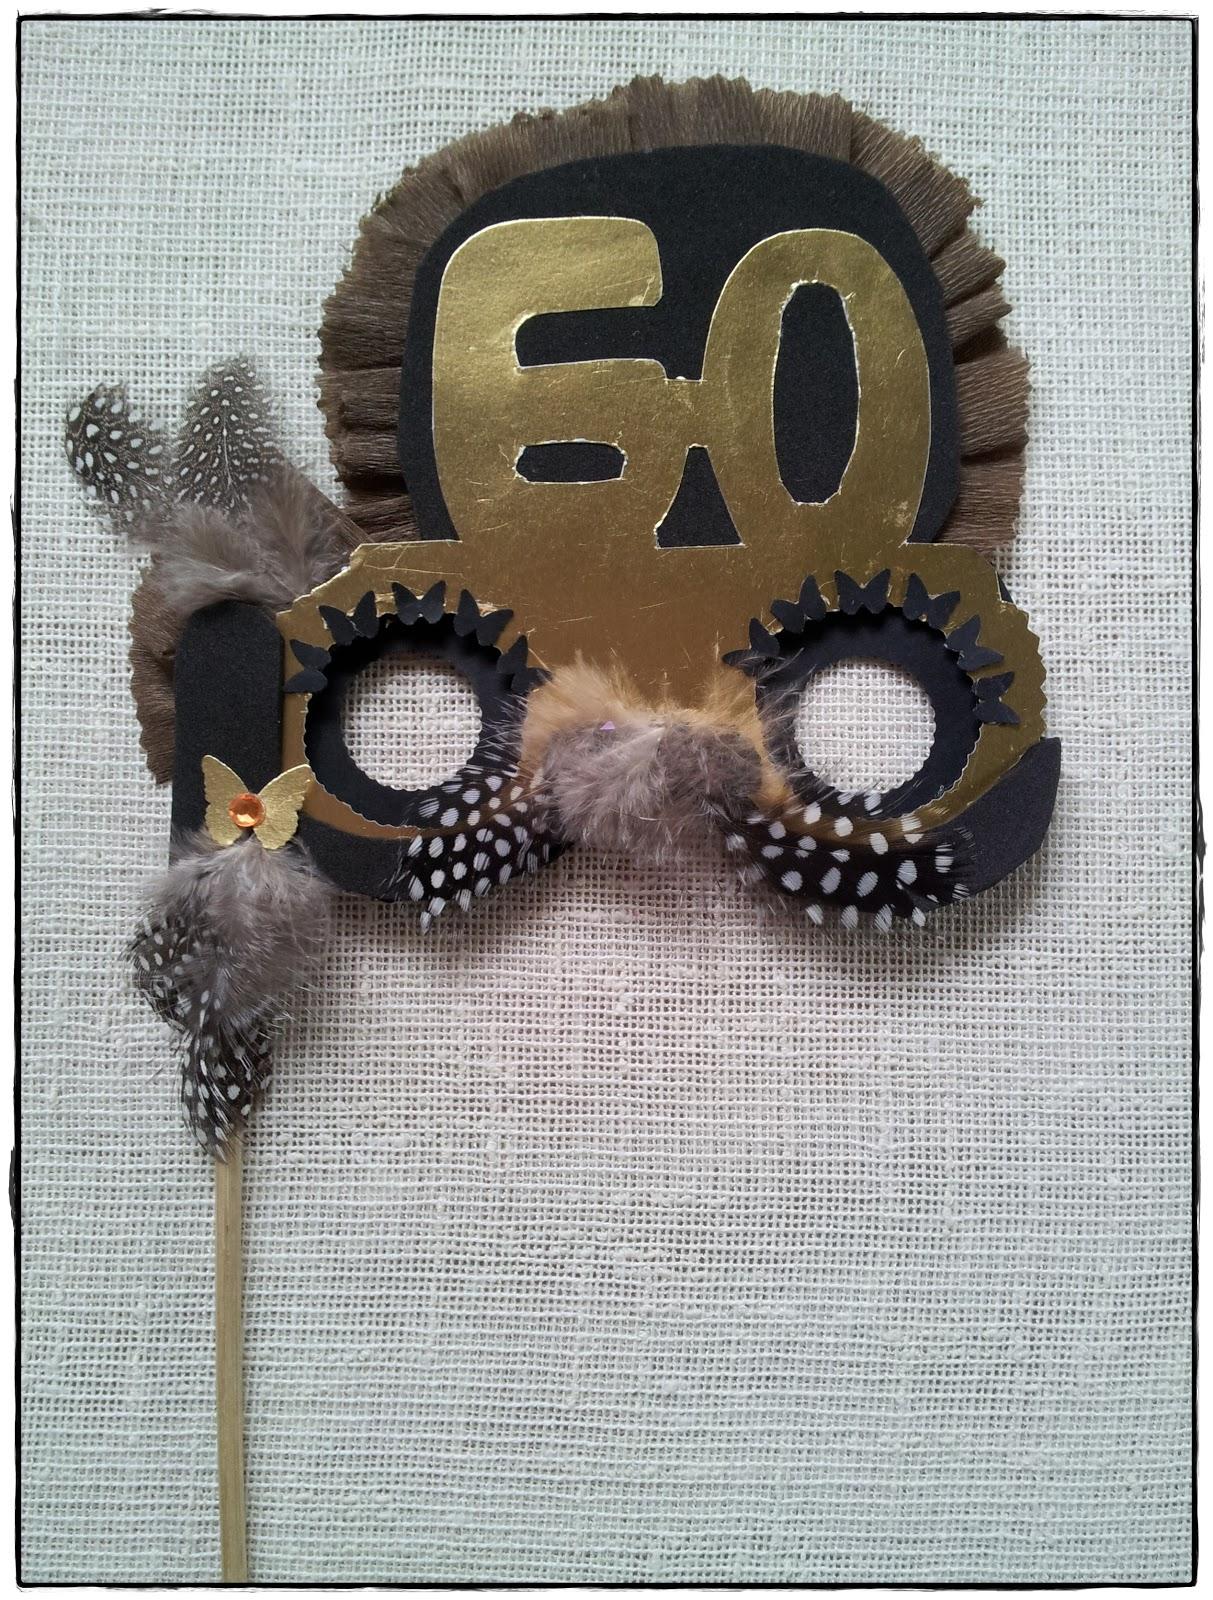 Fiesta 60 aniversario merbo events for Decoracion fiesta anos 60